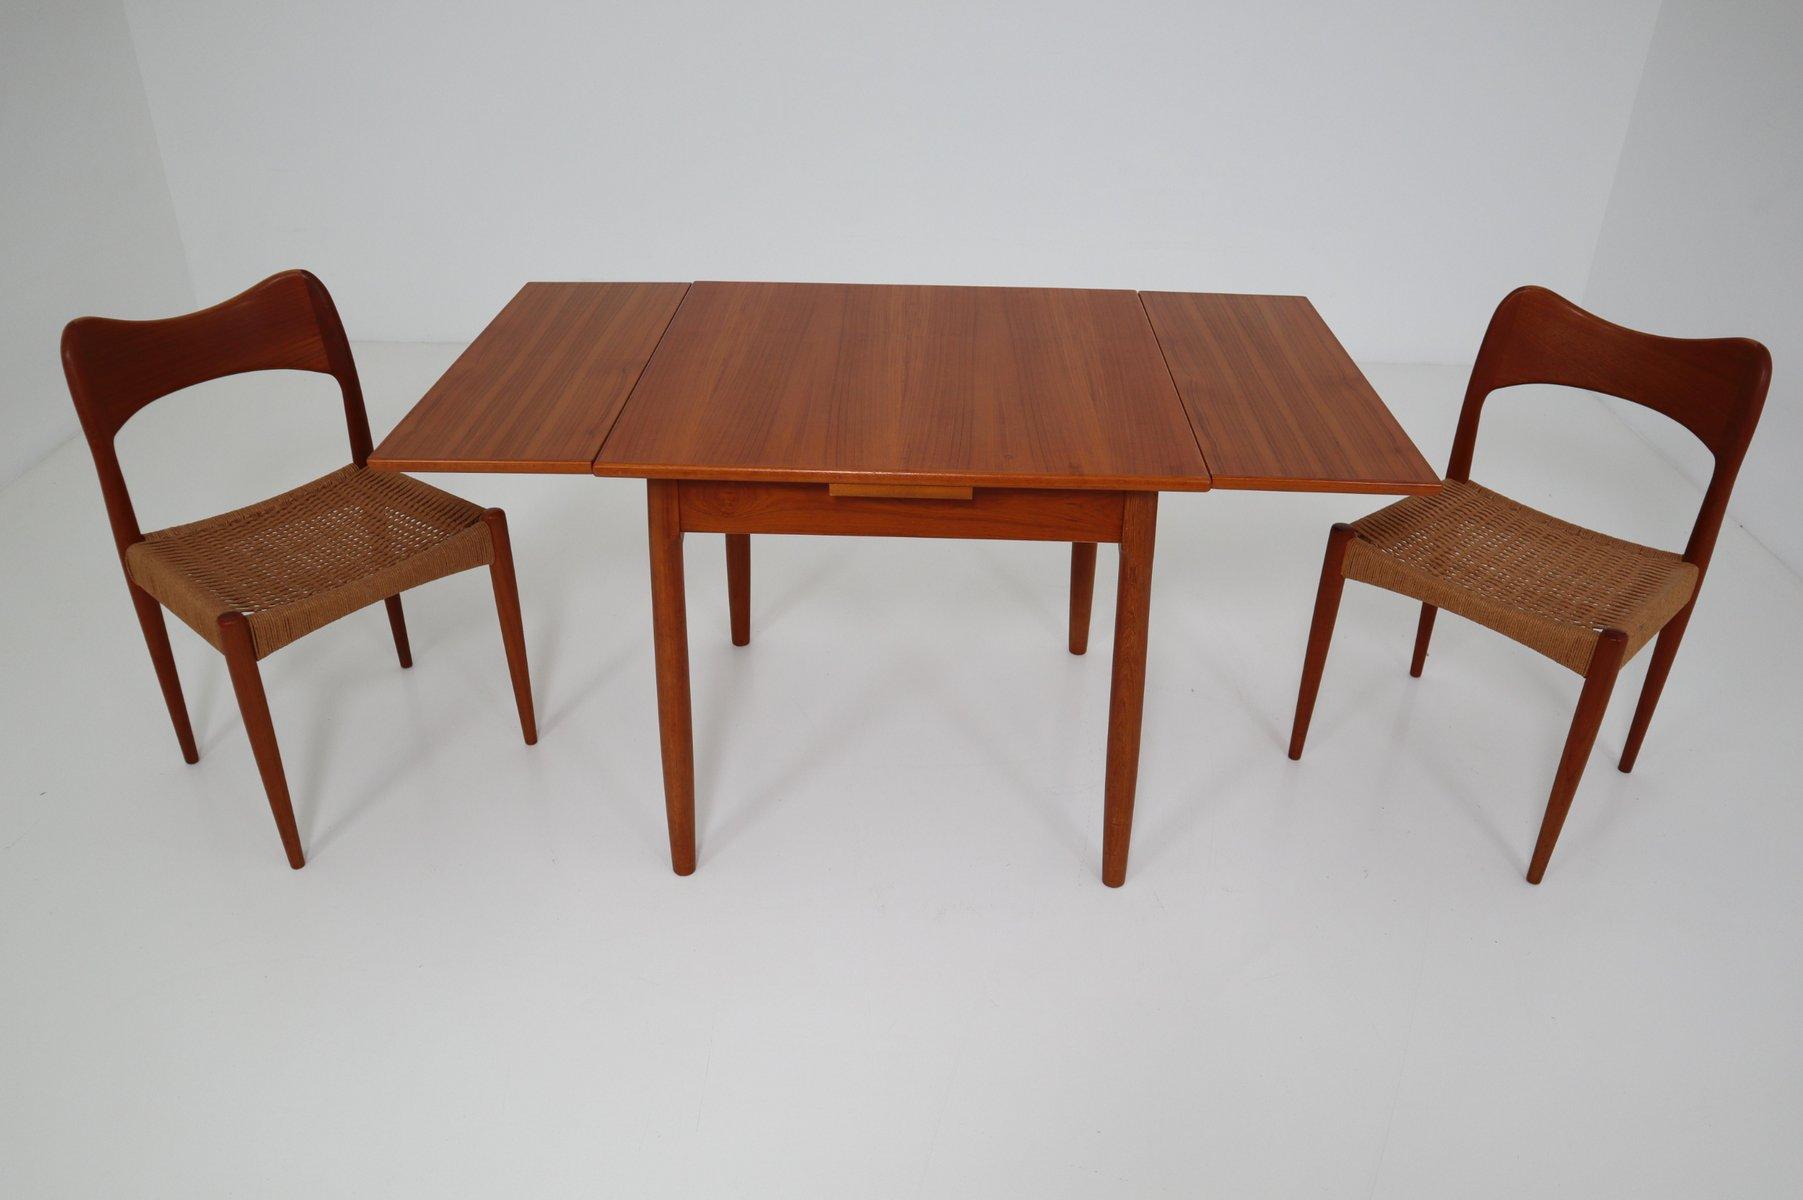 tisch und 2 st hle von niels o m ller f r j l m llers 1960 bei pamono kaufen. Black Bedroom Furniture Sets. Home Design Ideas